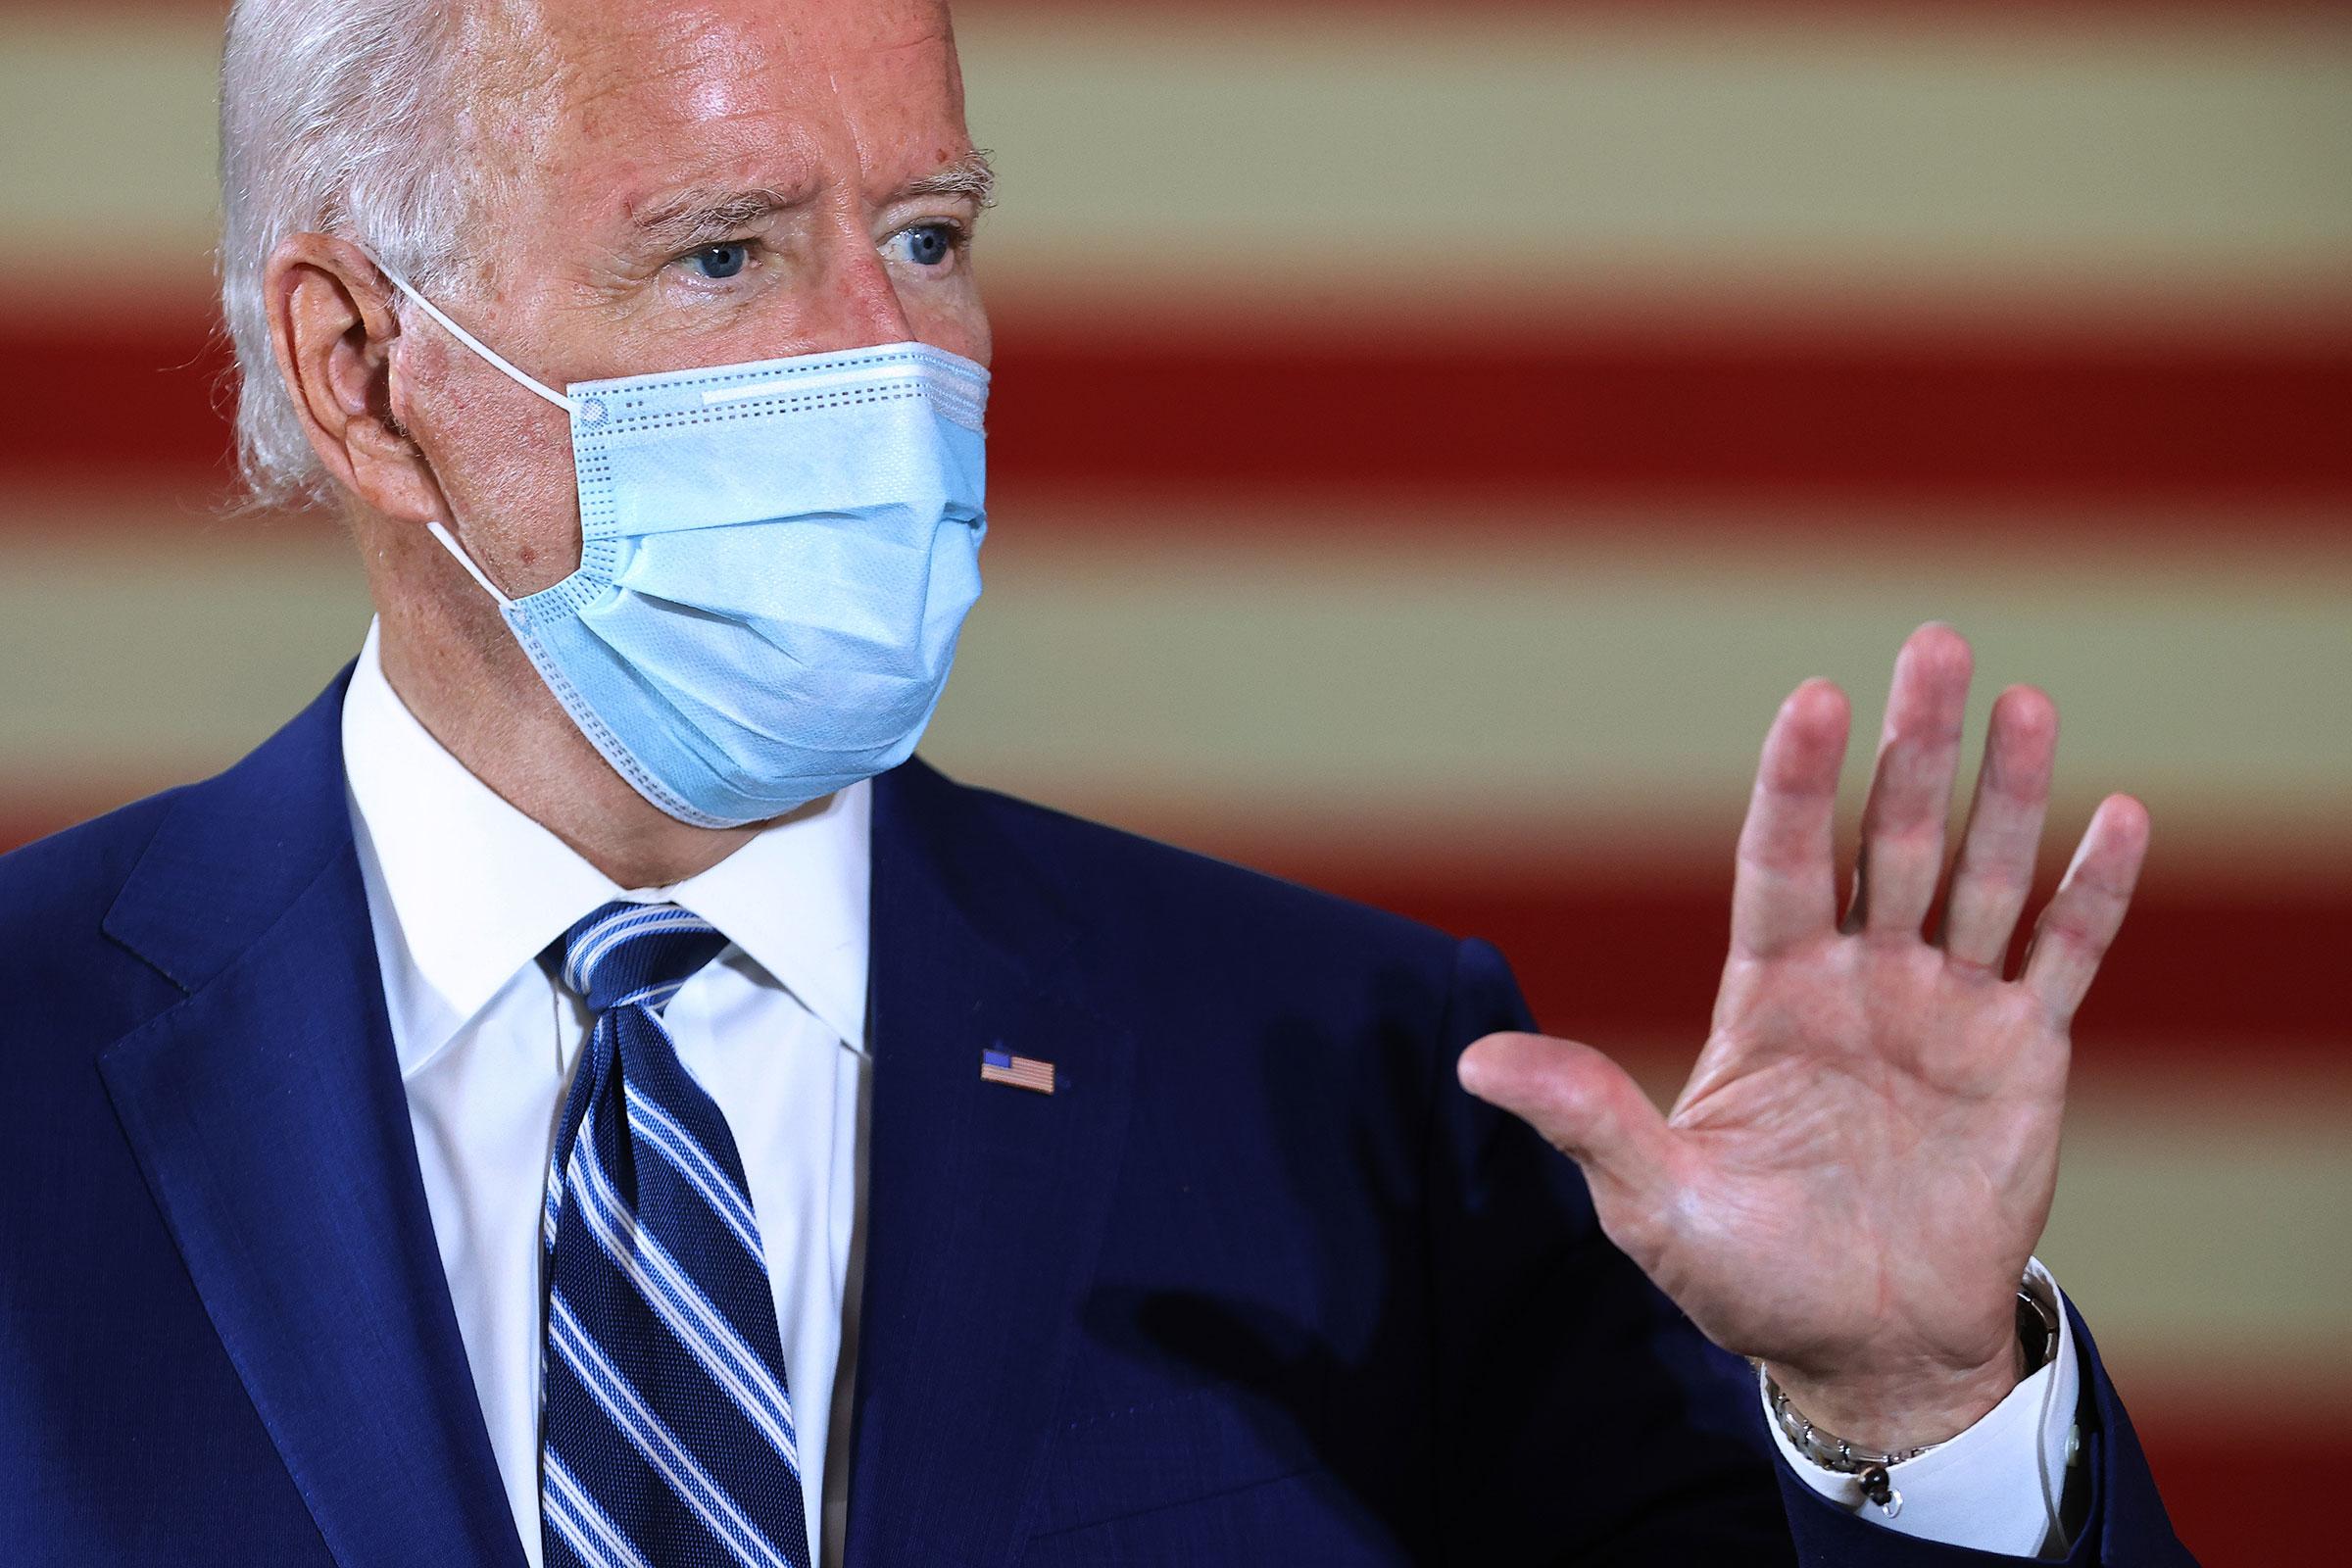 Joe Biden speaks at Southwest Focal Point Community Center on October 13 in Pembroke Pines, Florida.